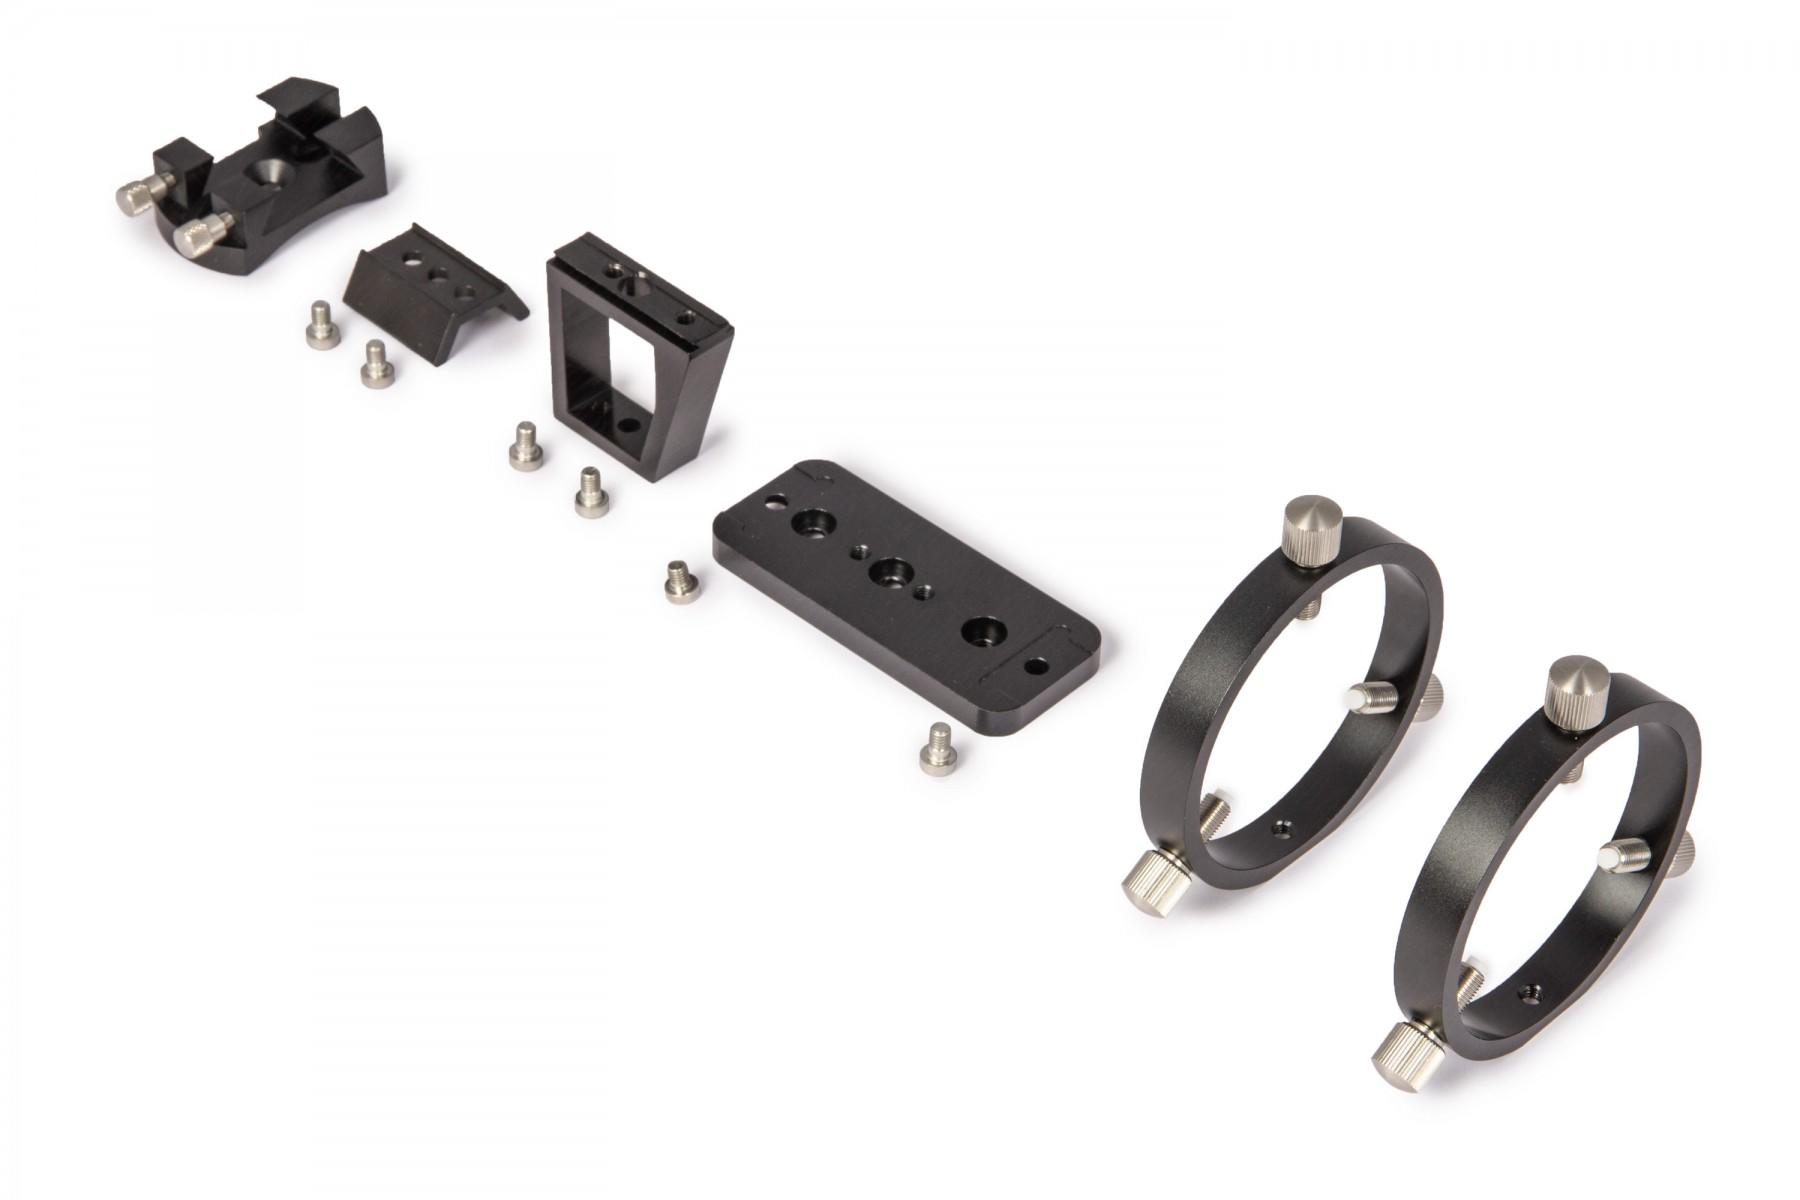 baader-multipurpose-finder-bracket-mqr-iii-7x50-max-62mm-95b.jpg